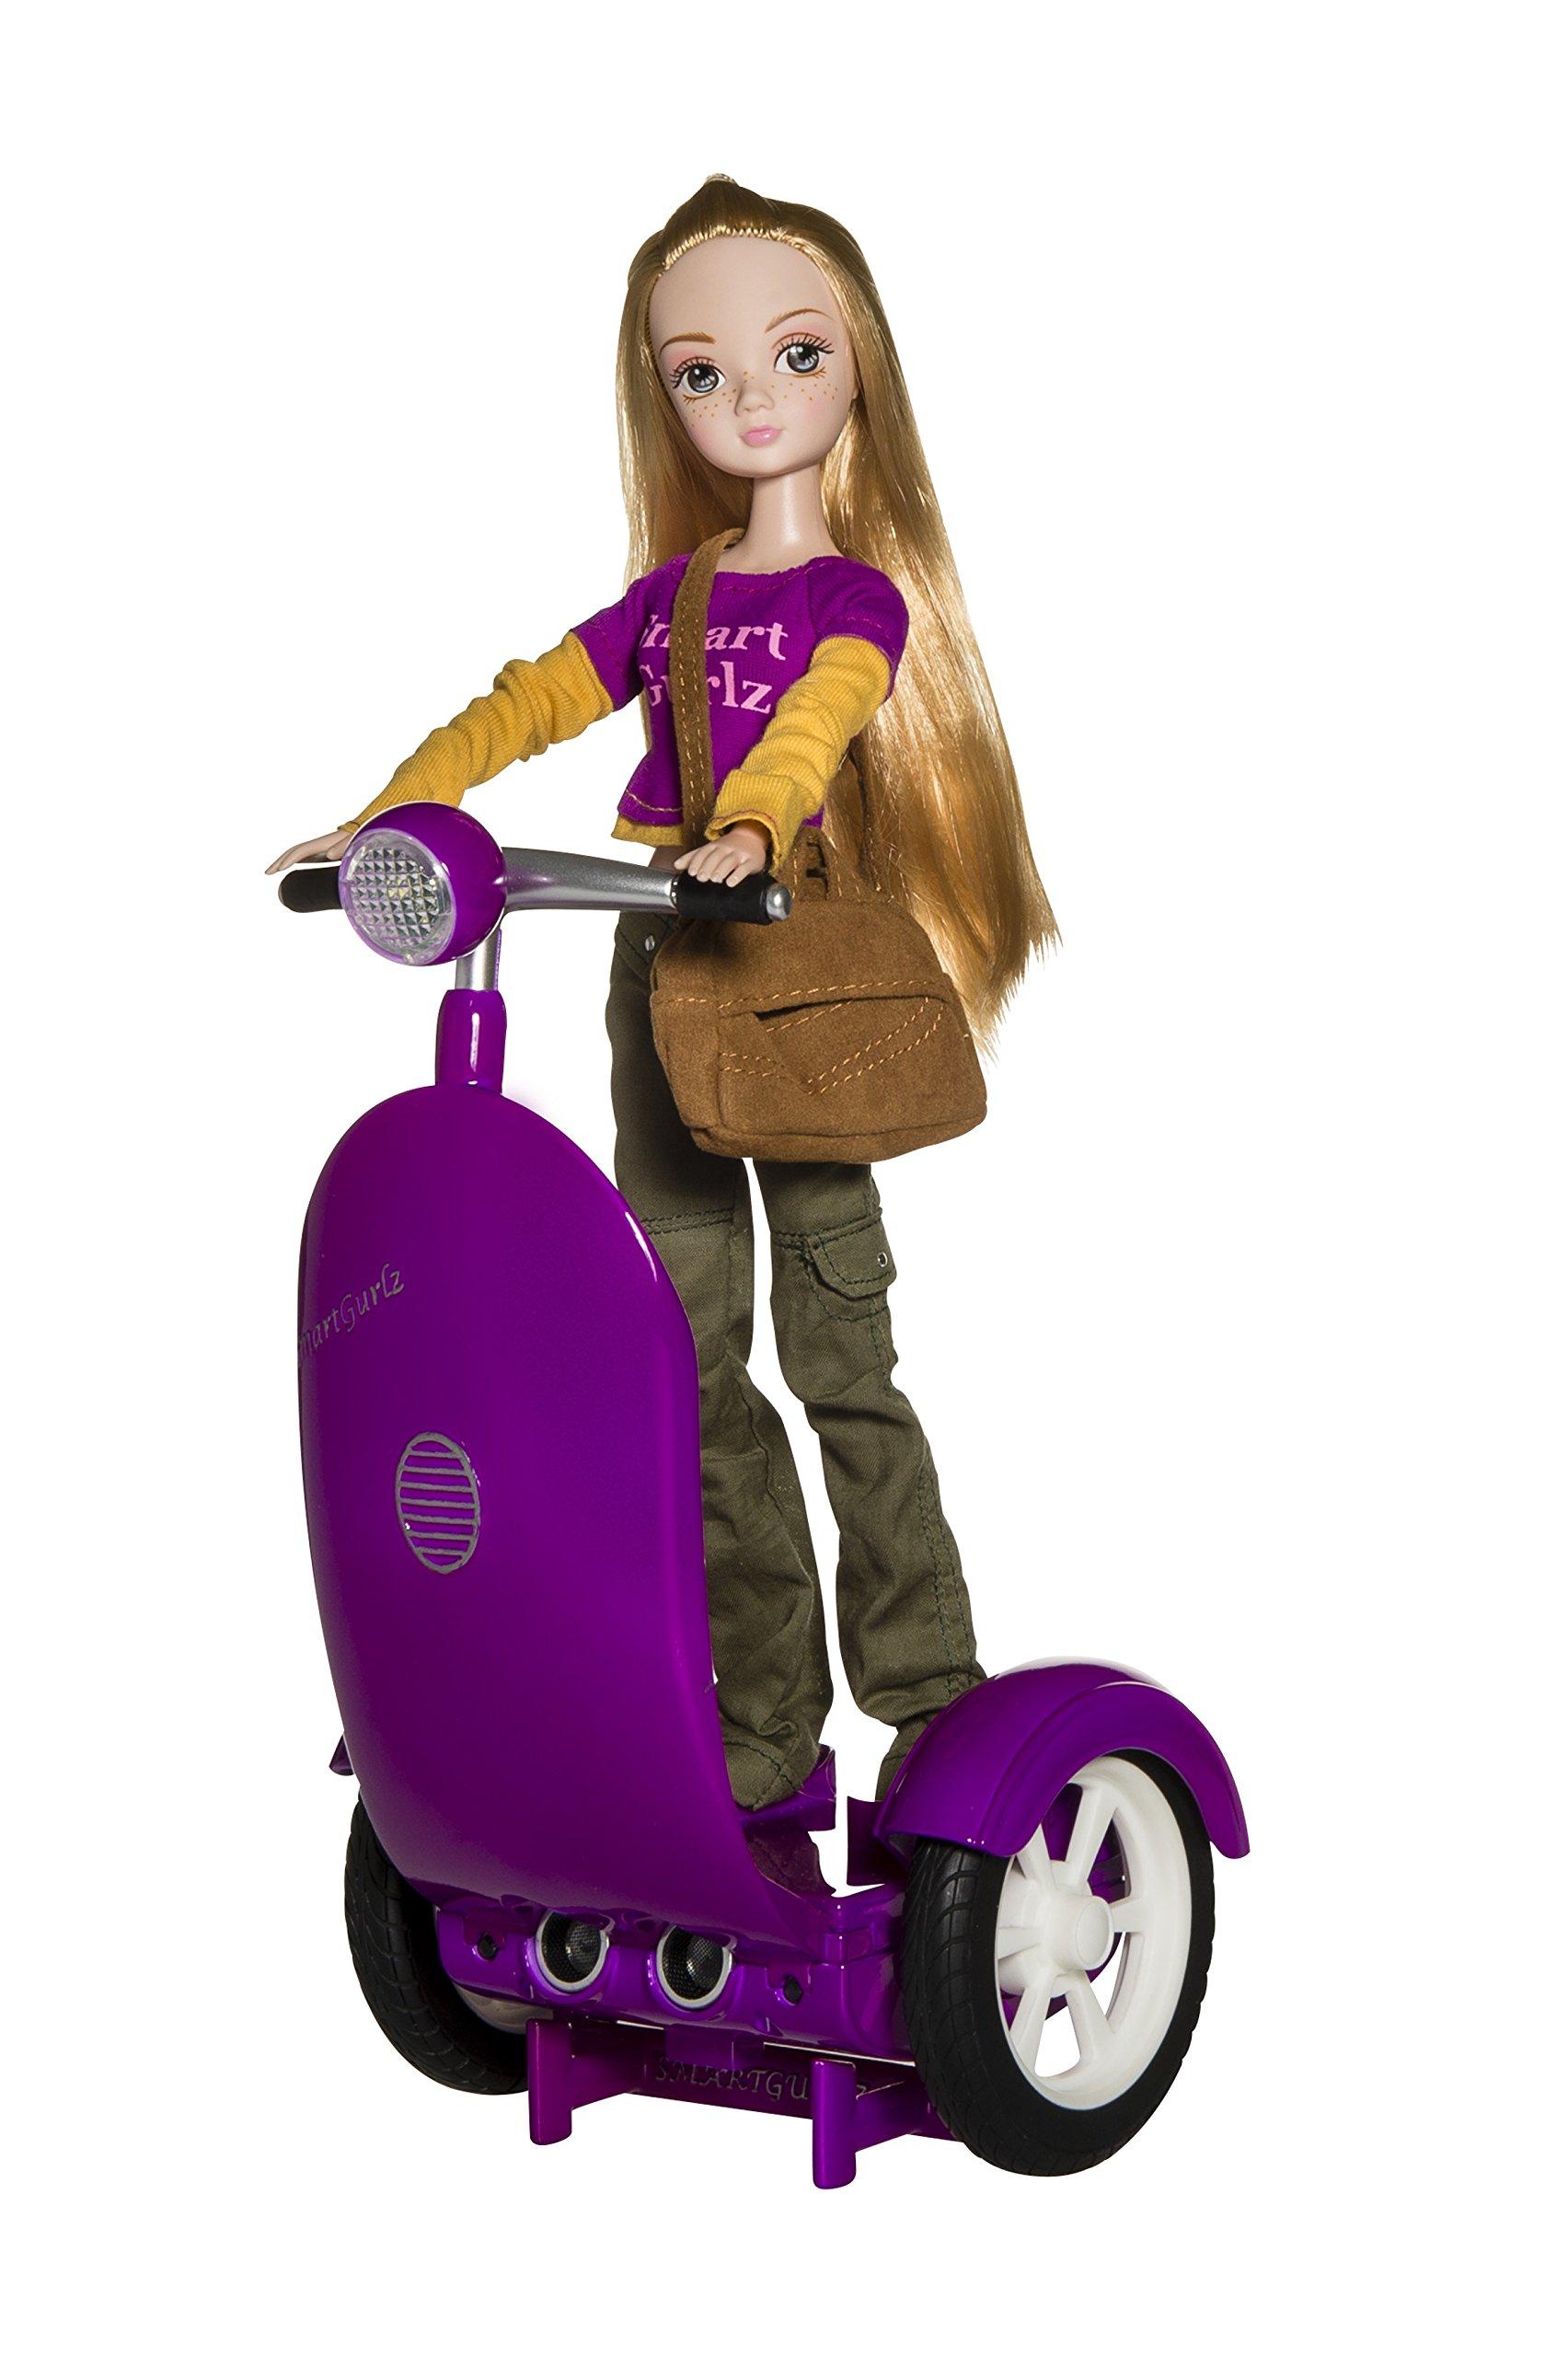 SmartGurlz Siggy SG C Educational Robot Doll STEM Toys Best